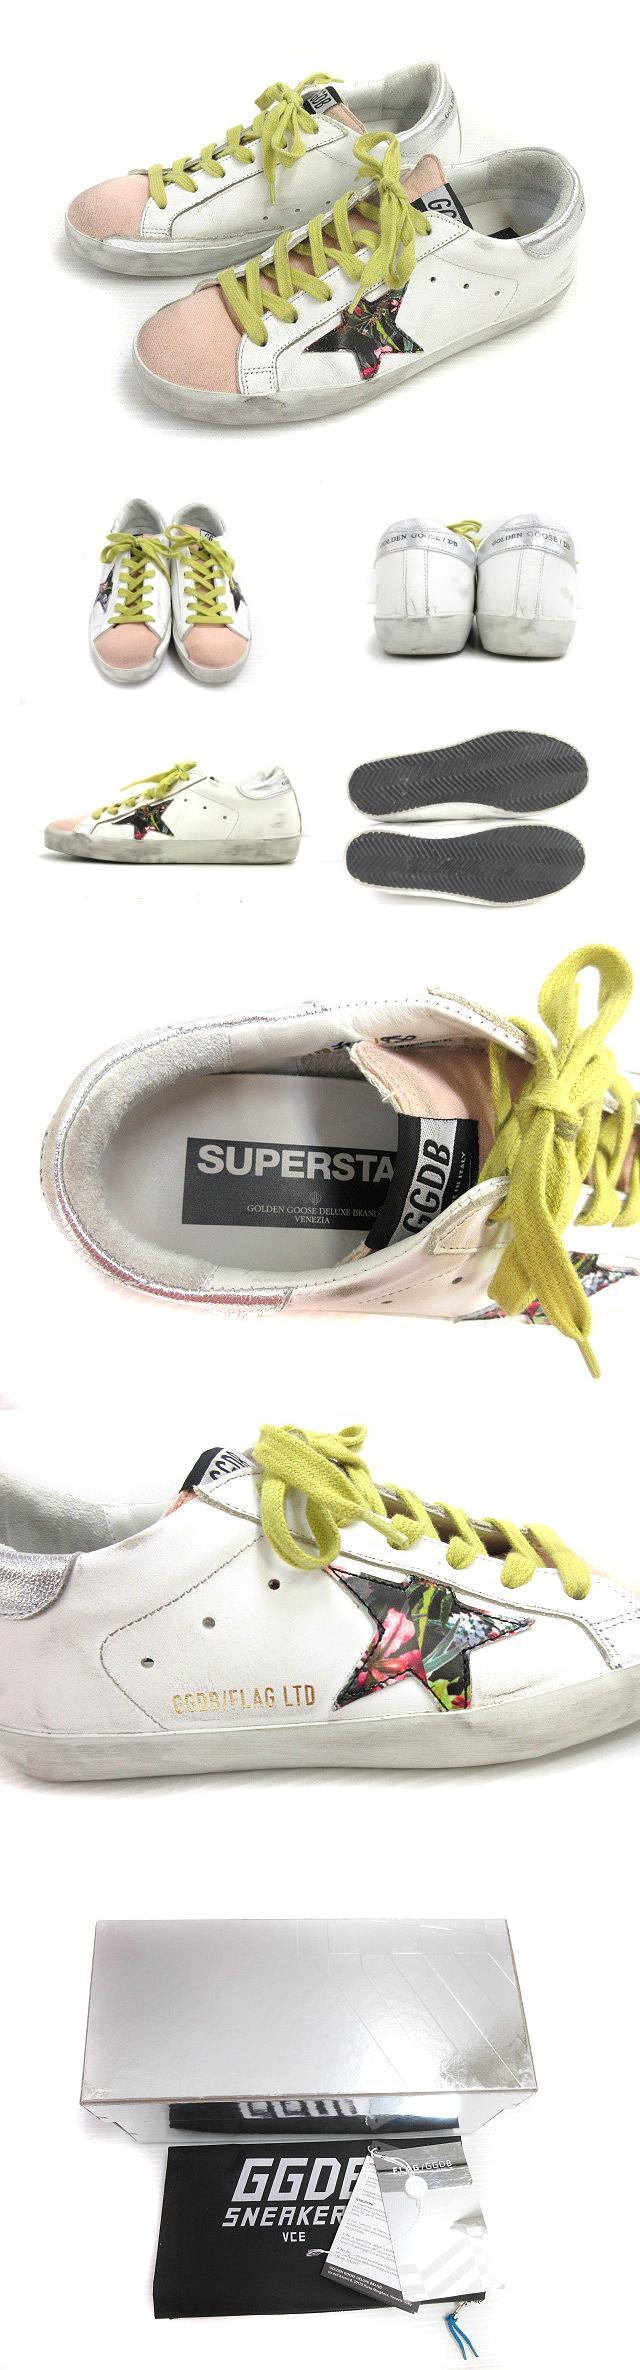 19SS SUPER STAR スーパー スター スニーカー 汚れ加工 星 ダメージ加工 靴 シューズ 37 ホワイト オレンジ